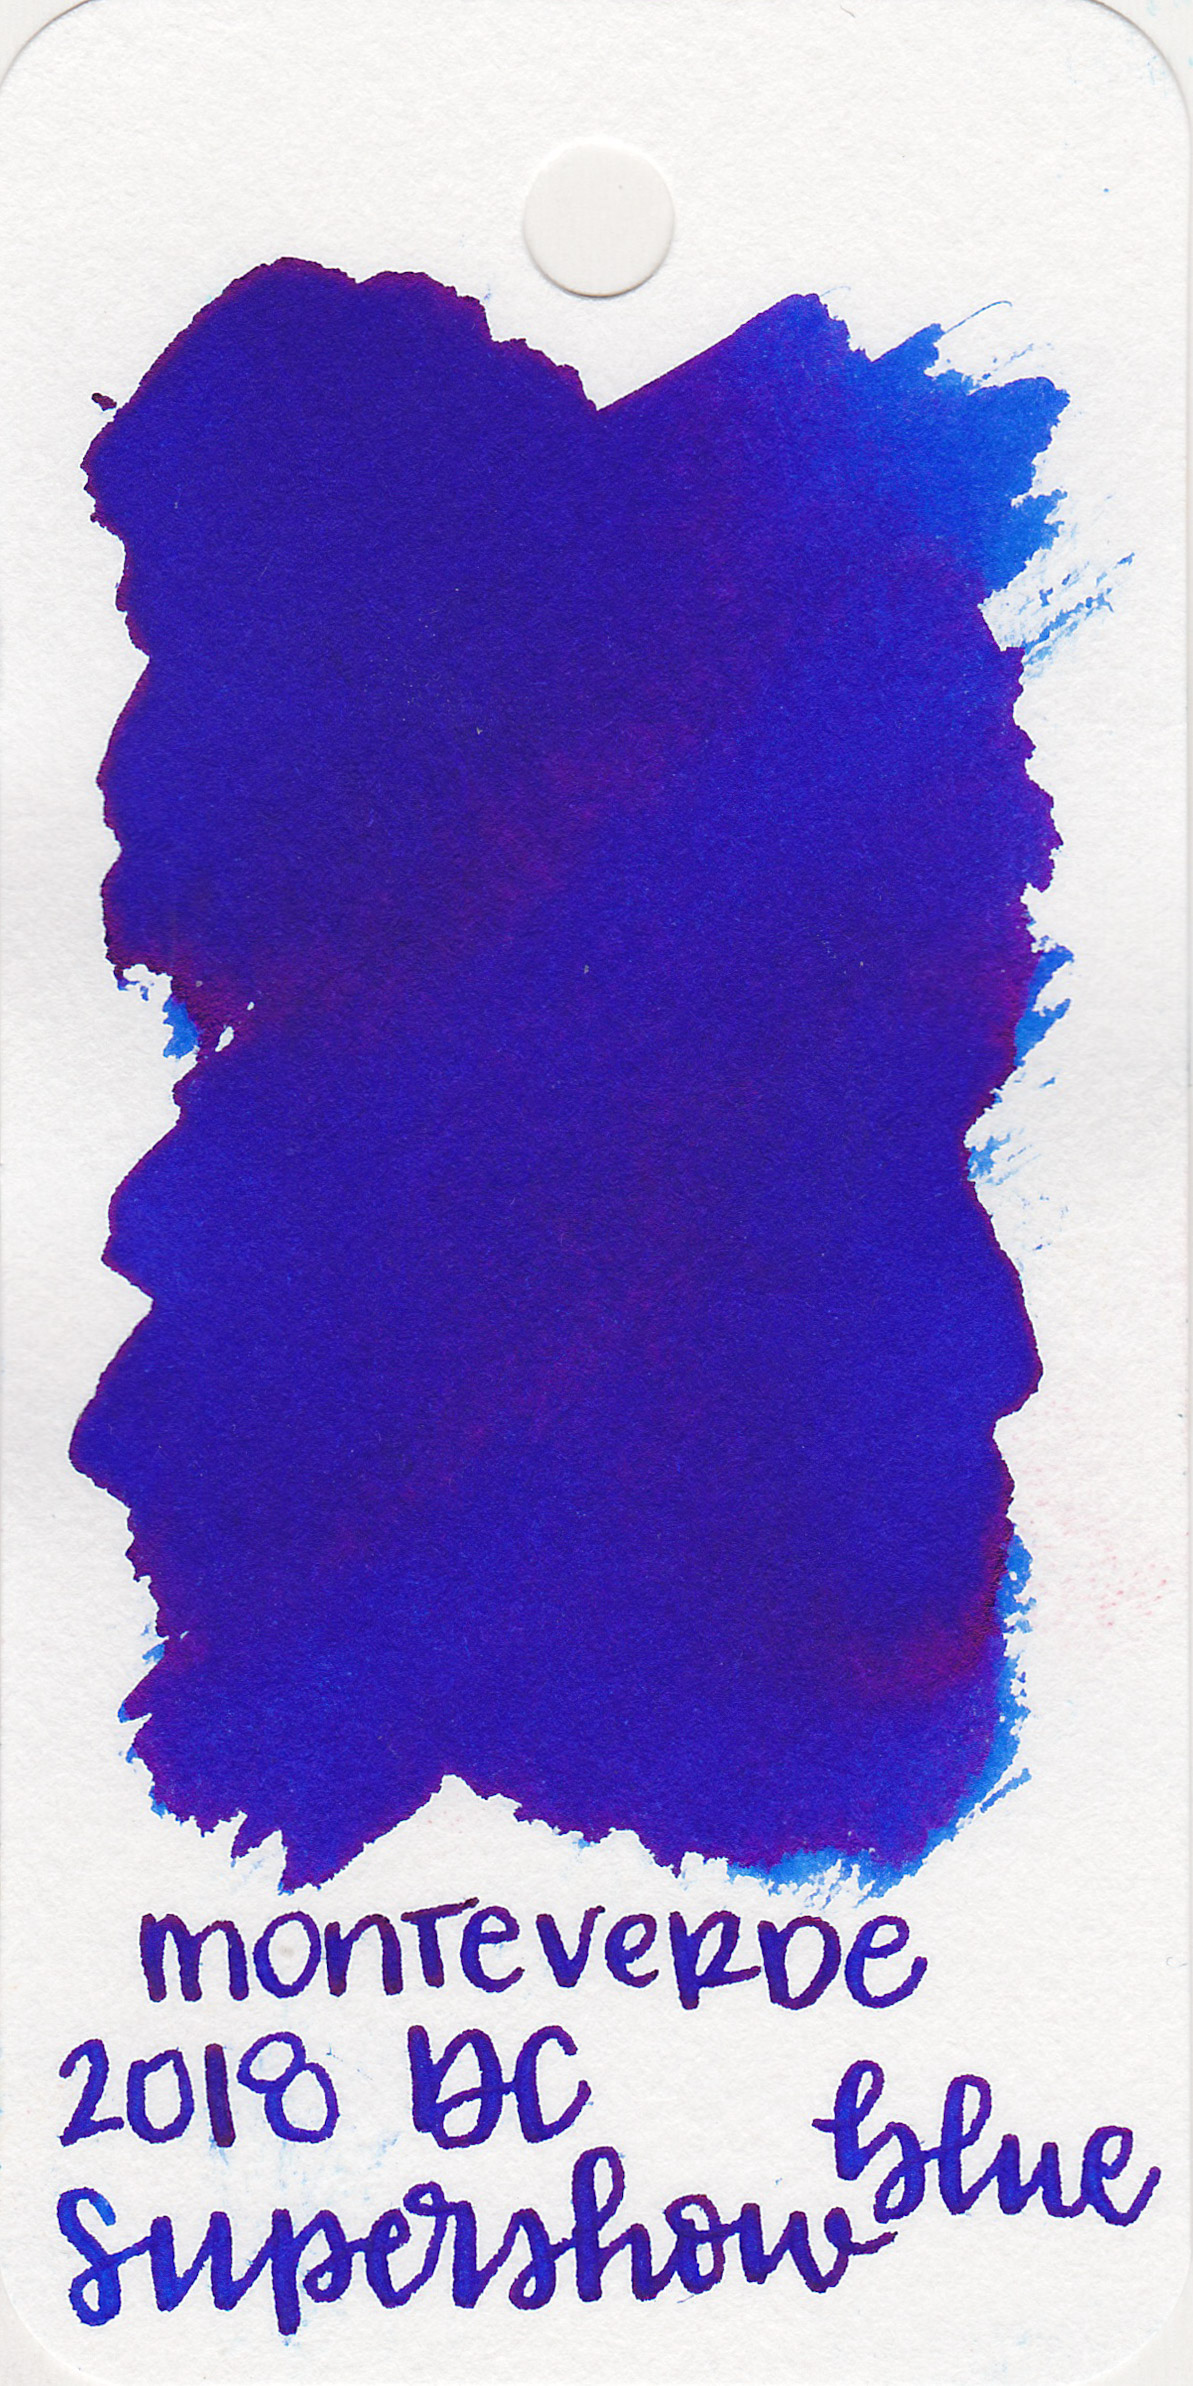 The color: - DC Supershow Blue is a medium, vibrant blue.